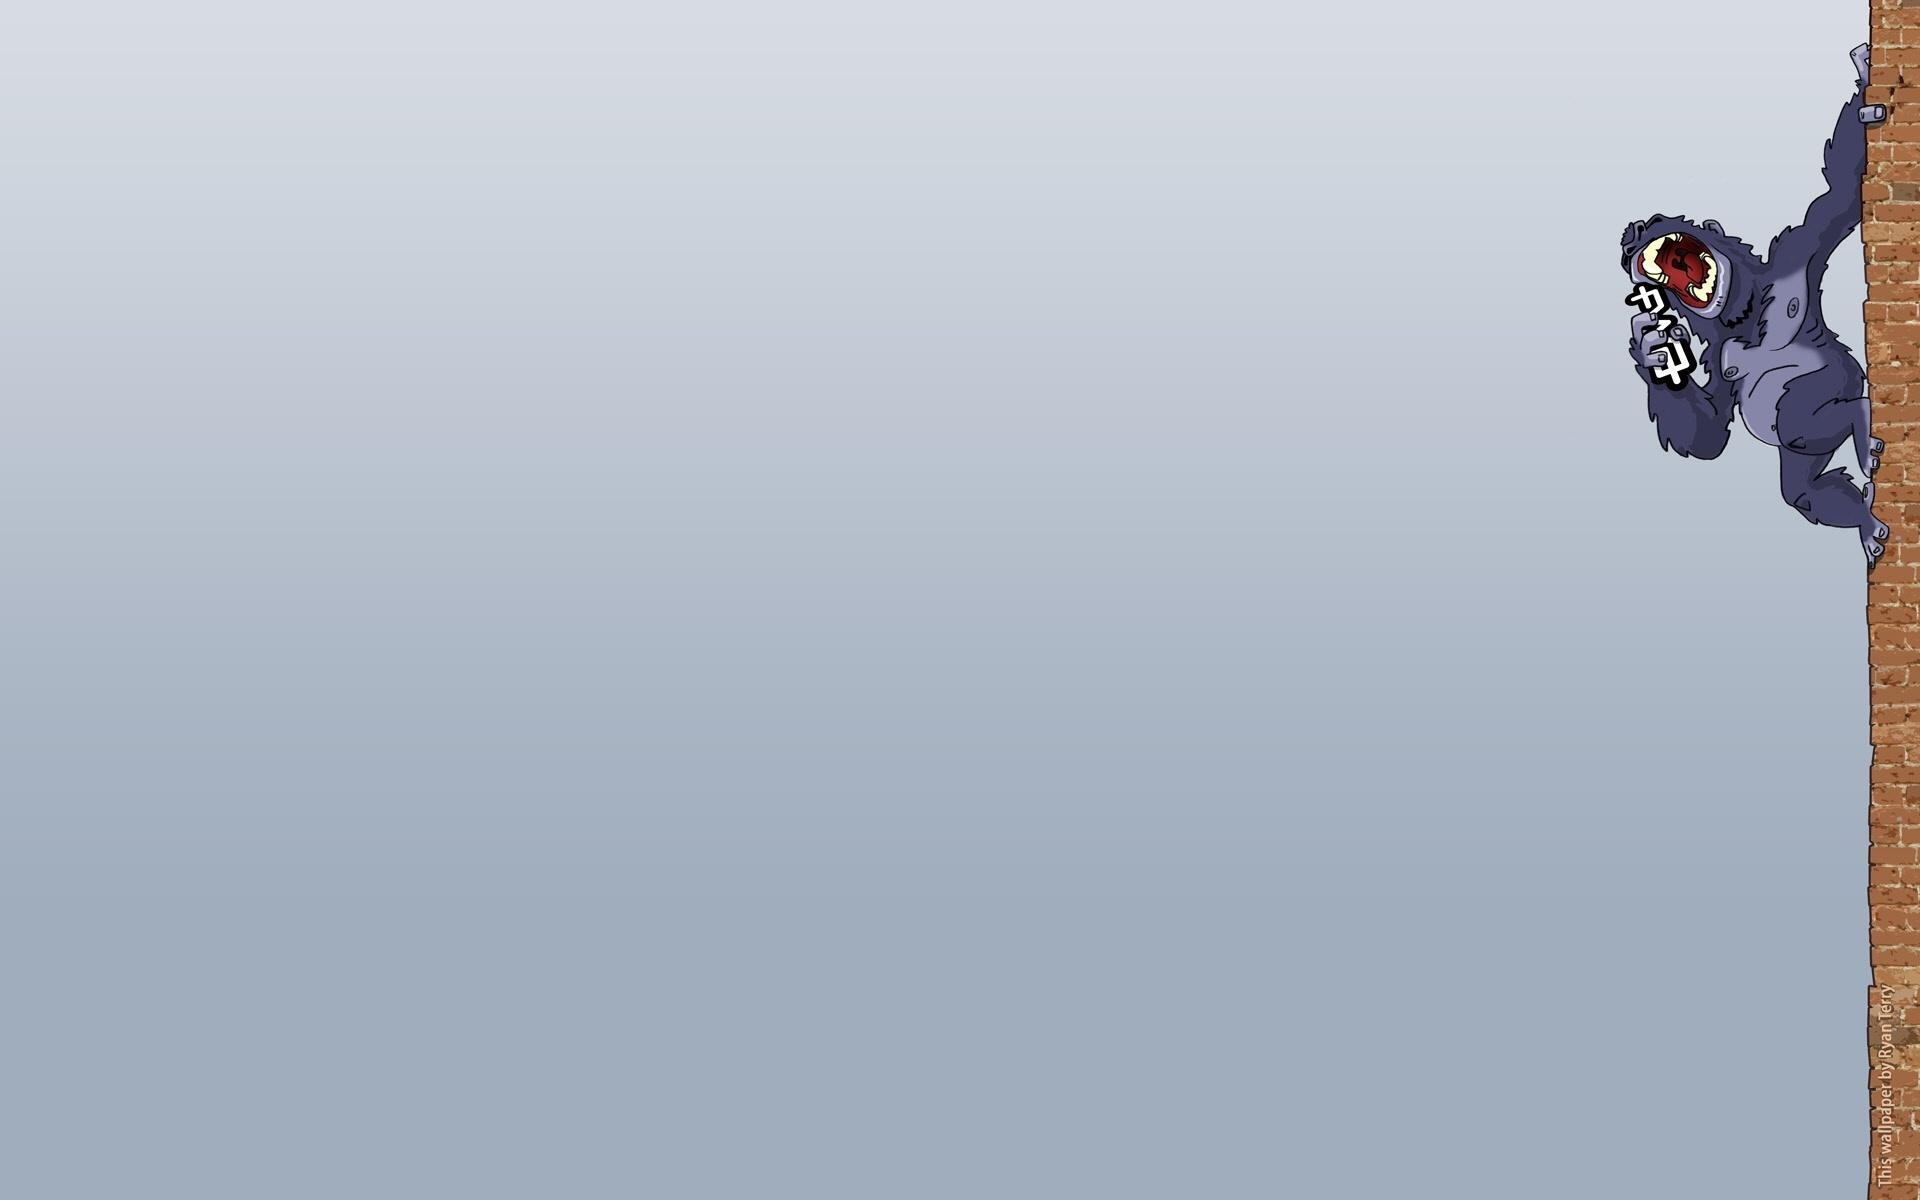 5553 descargar fondo de pantalla Divertido, Imágenes, Monos: protectores de pantalla e imágenes gratis